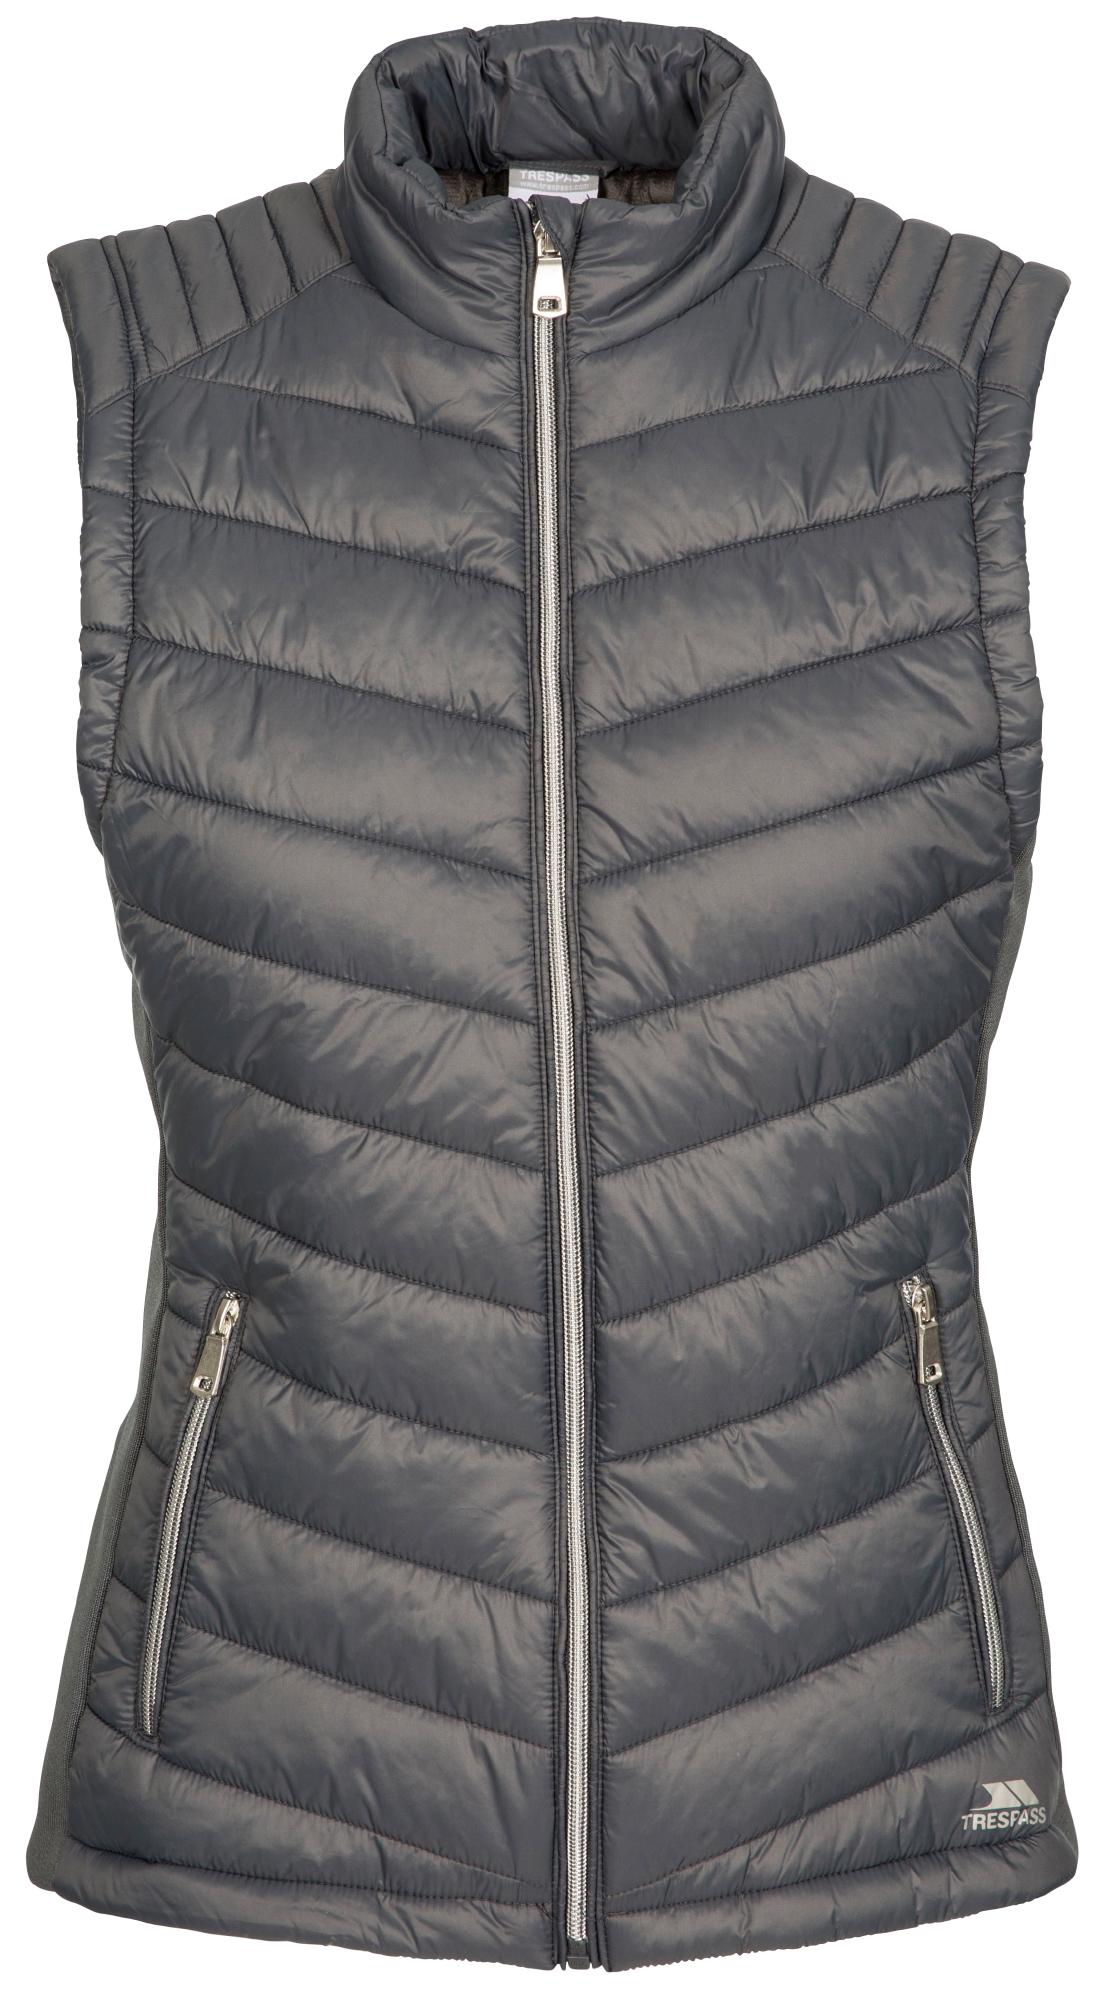 Trespass Elanora - Fibervest dame - Carbon   Vests